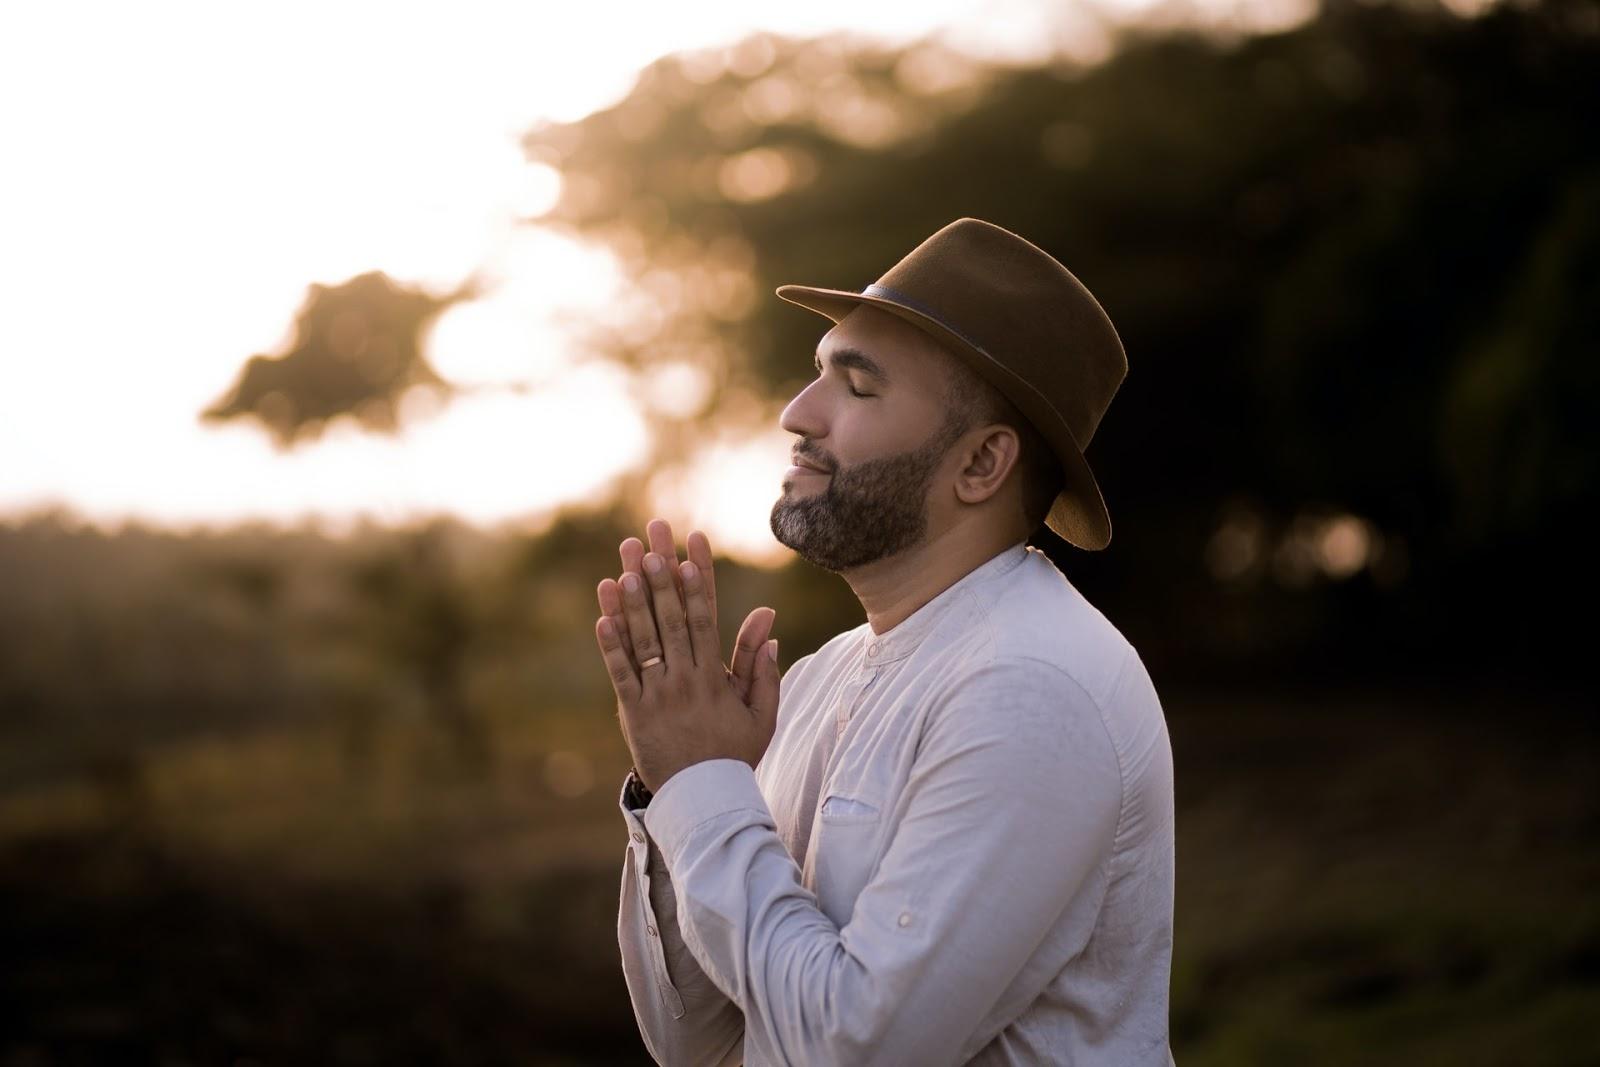 man praying in a field